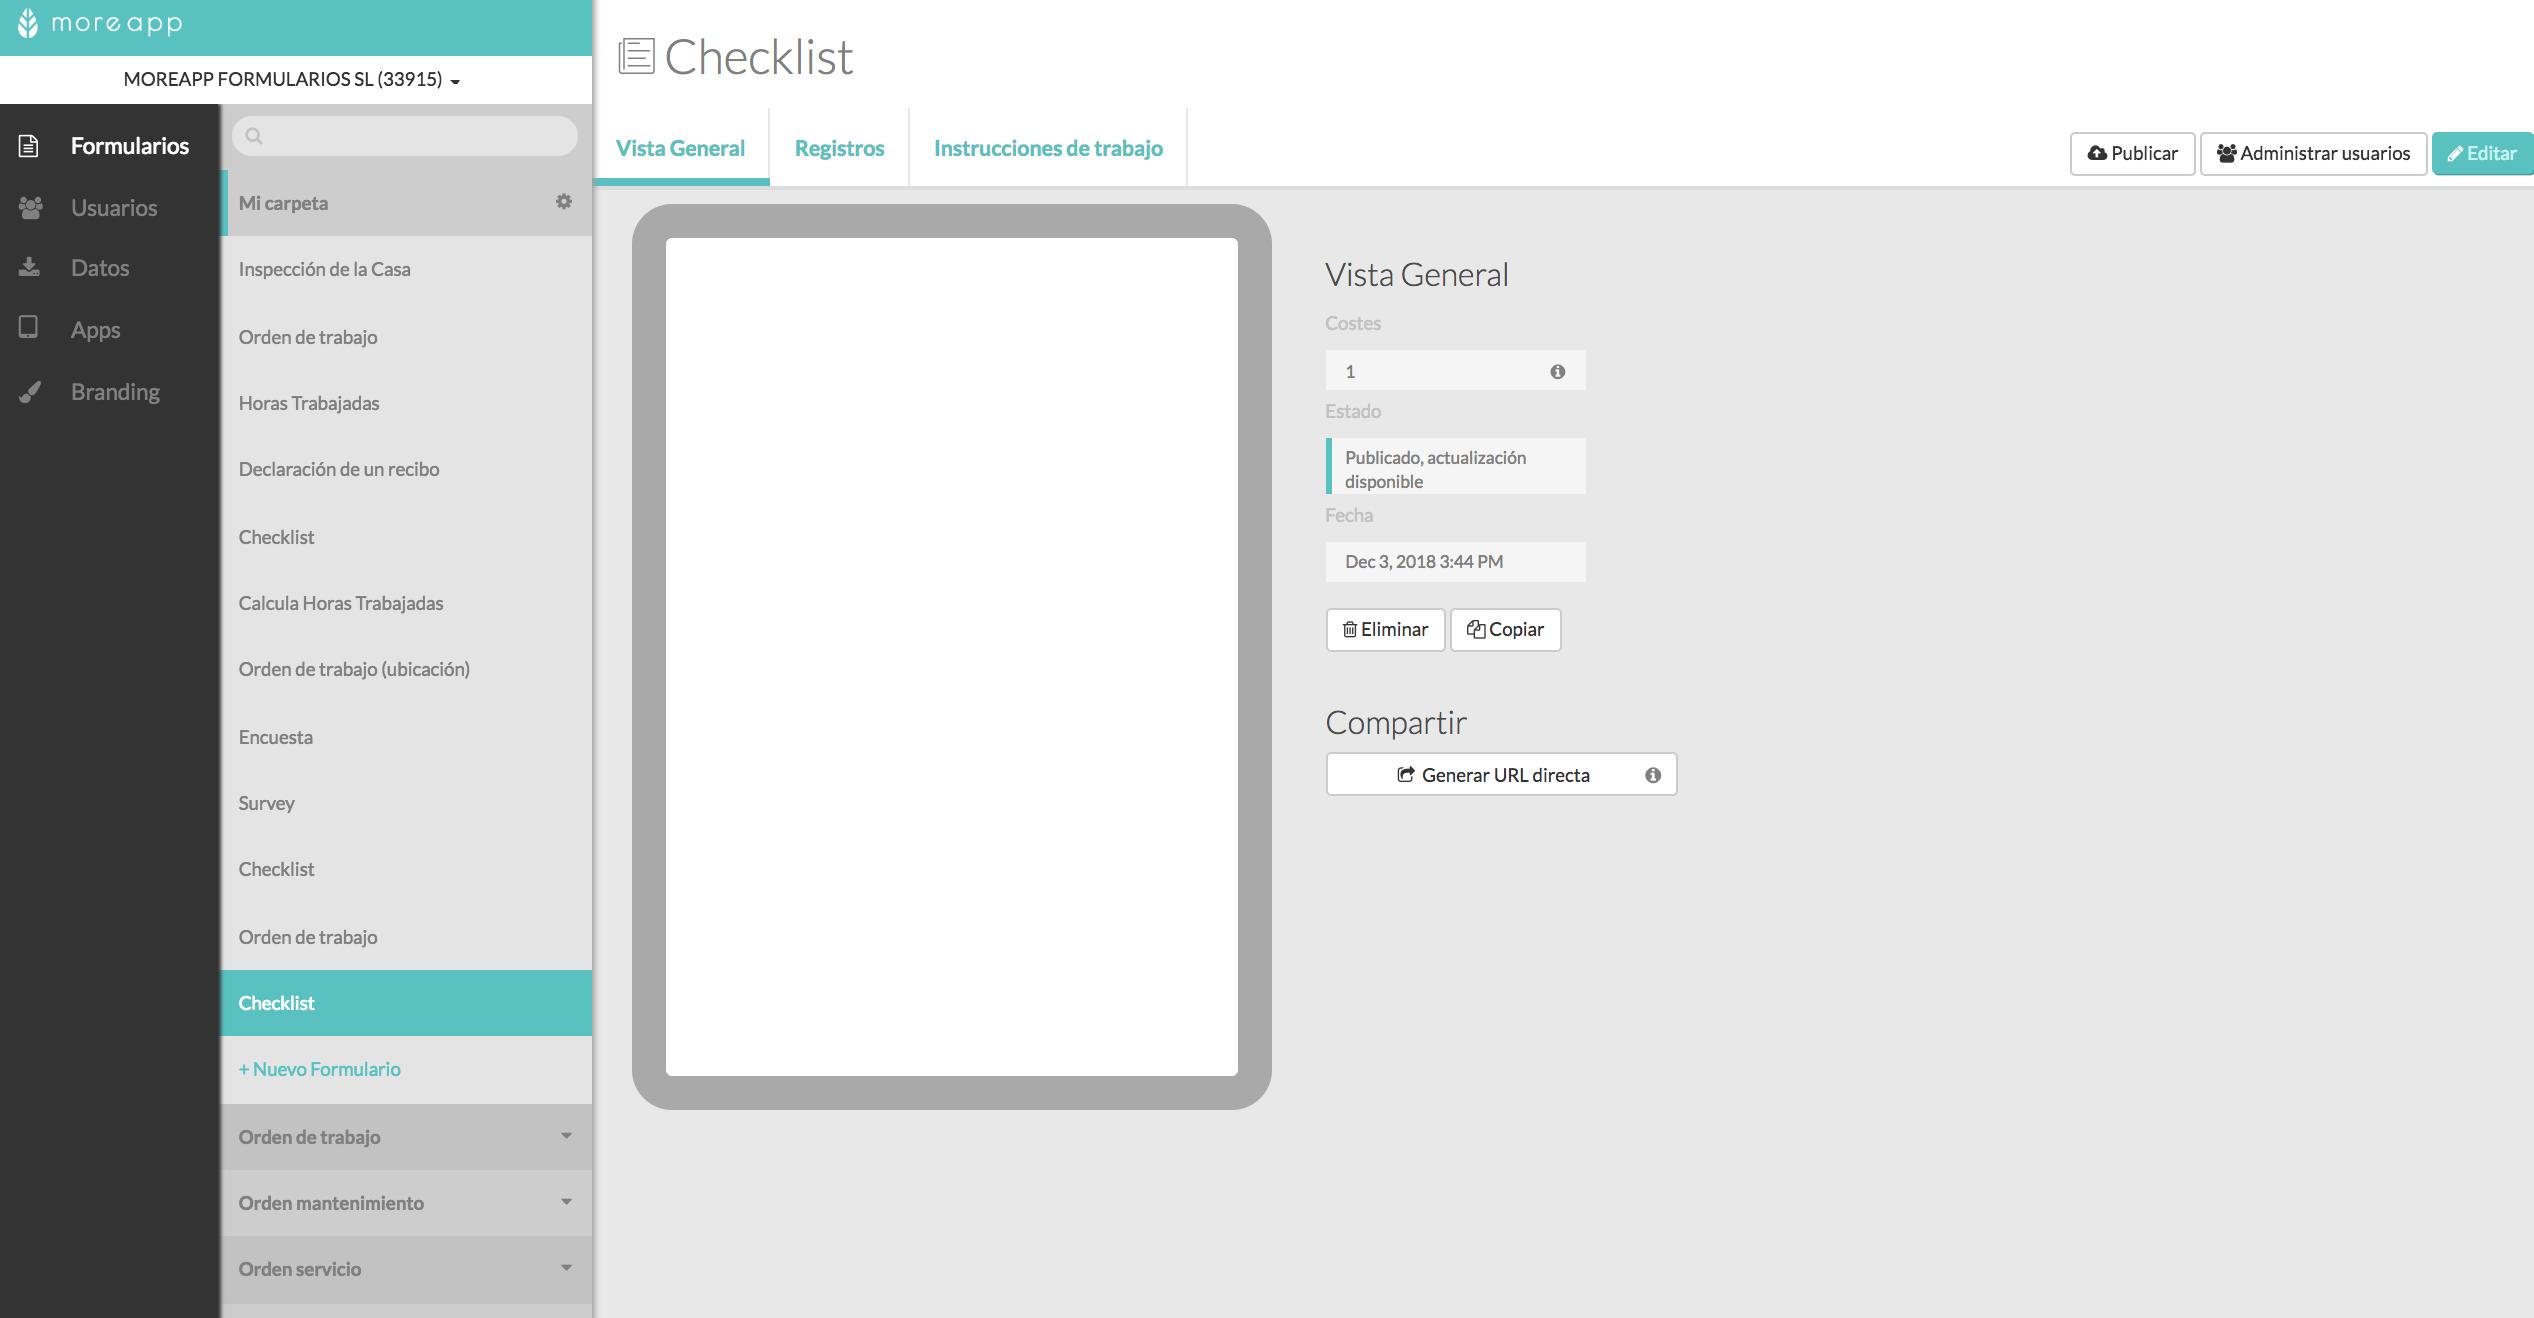 Checklist Plataforma MoreApp